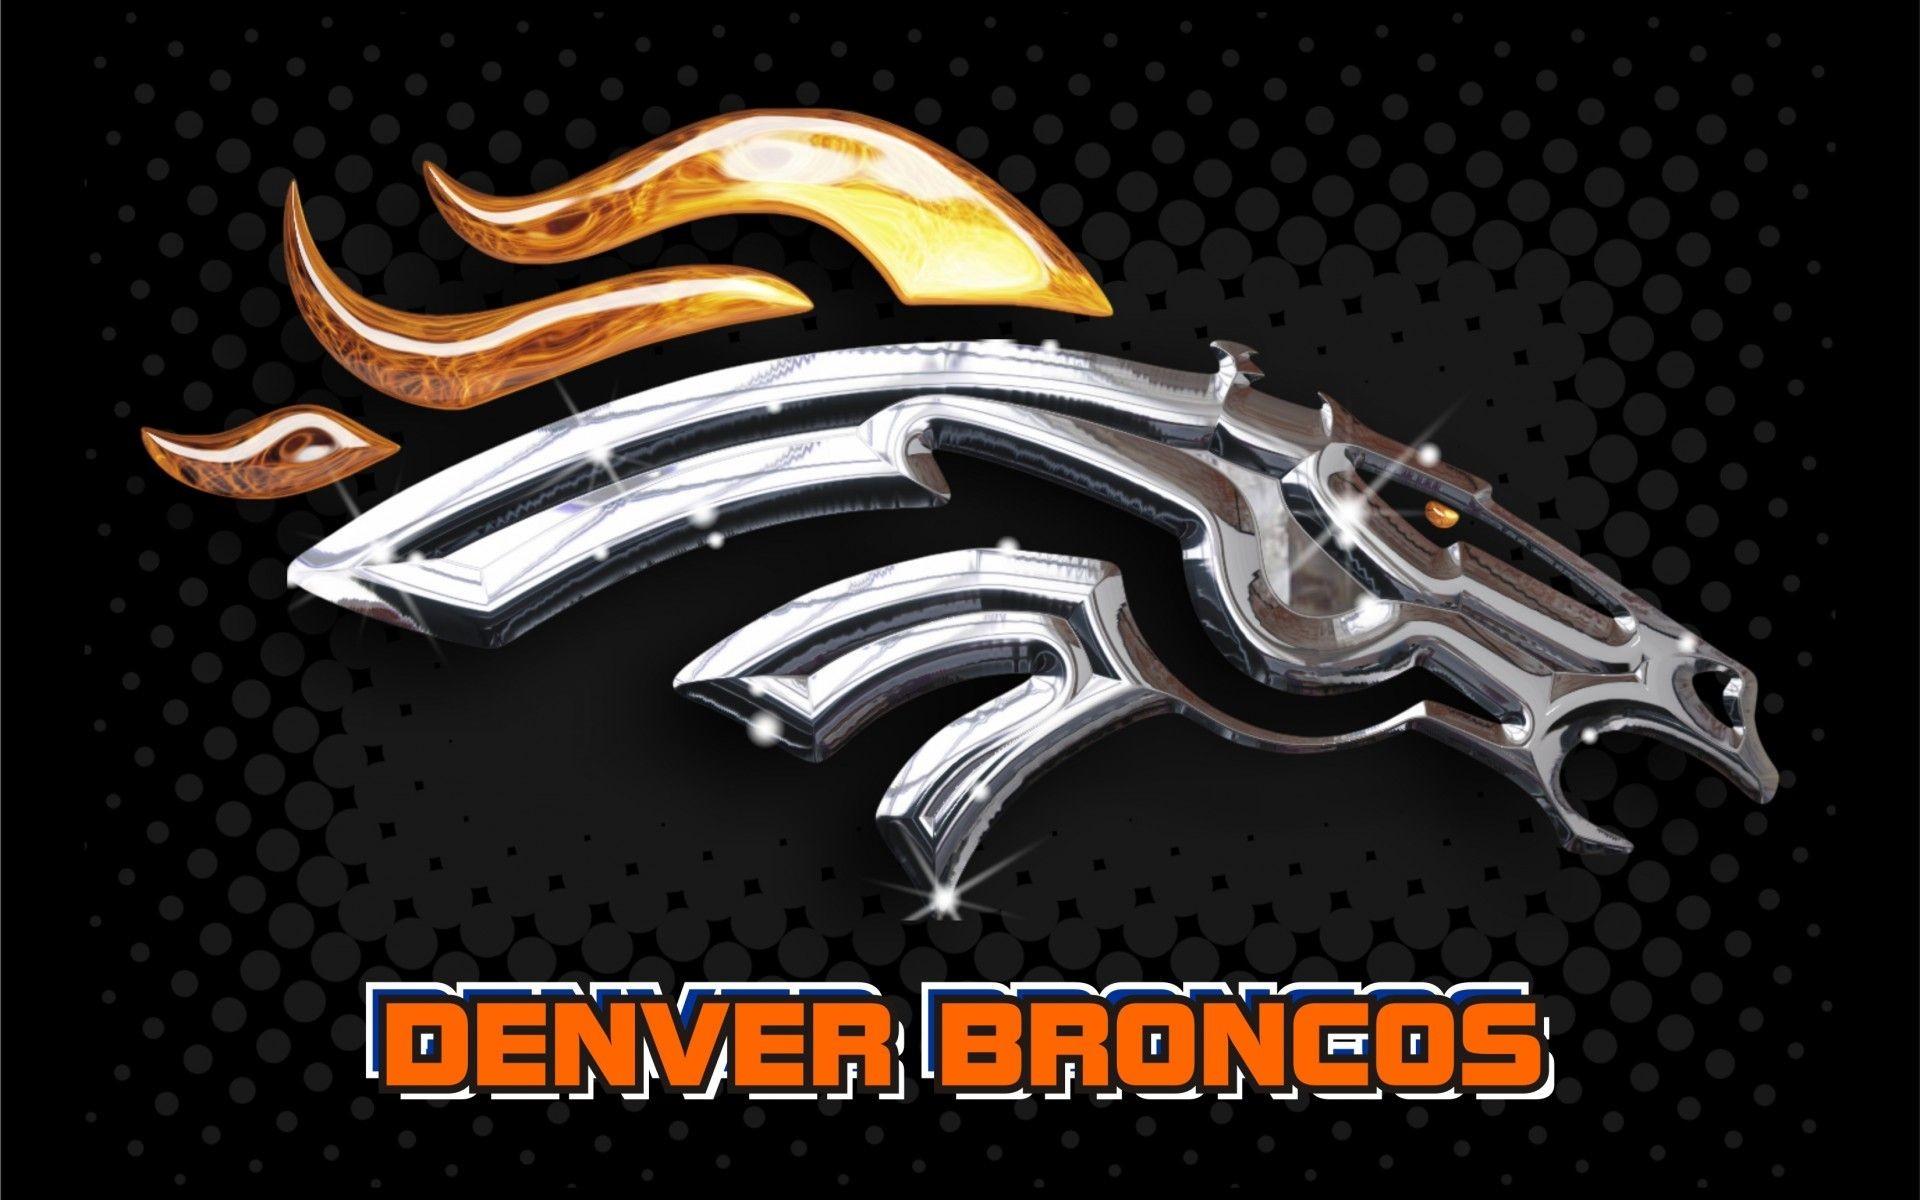 Denver Broncos Jersey Wallpaper – WallpaperSafari